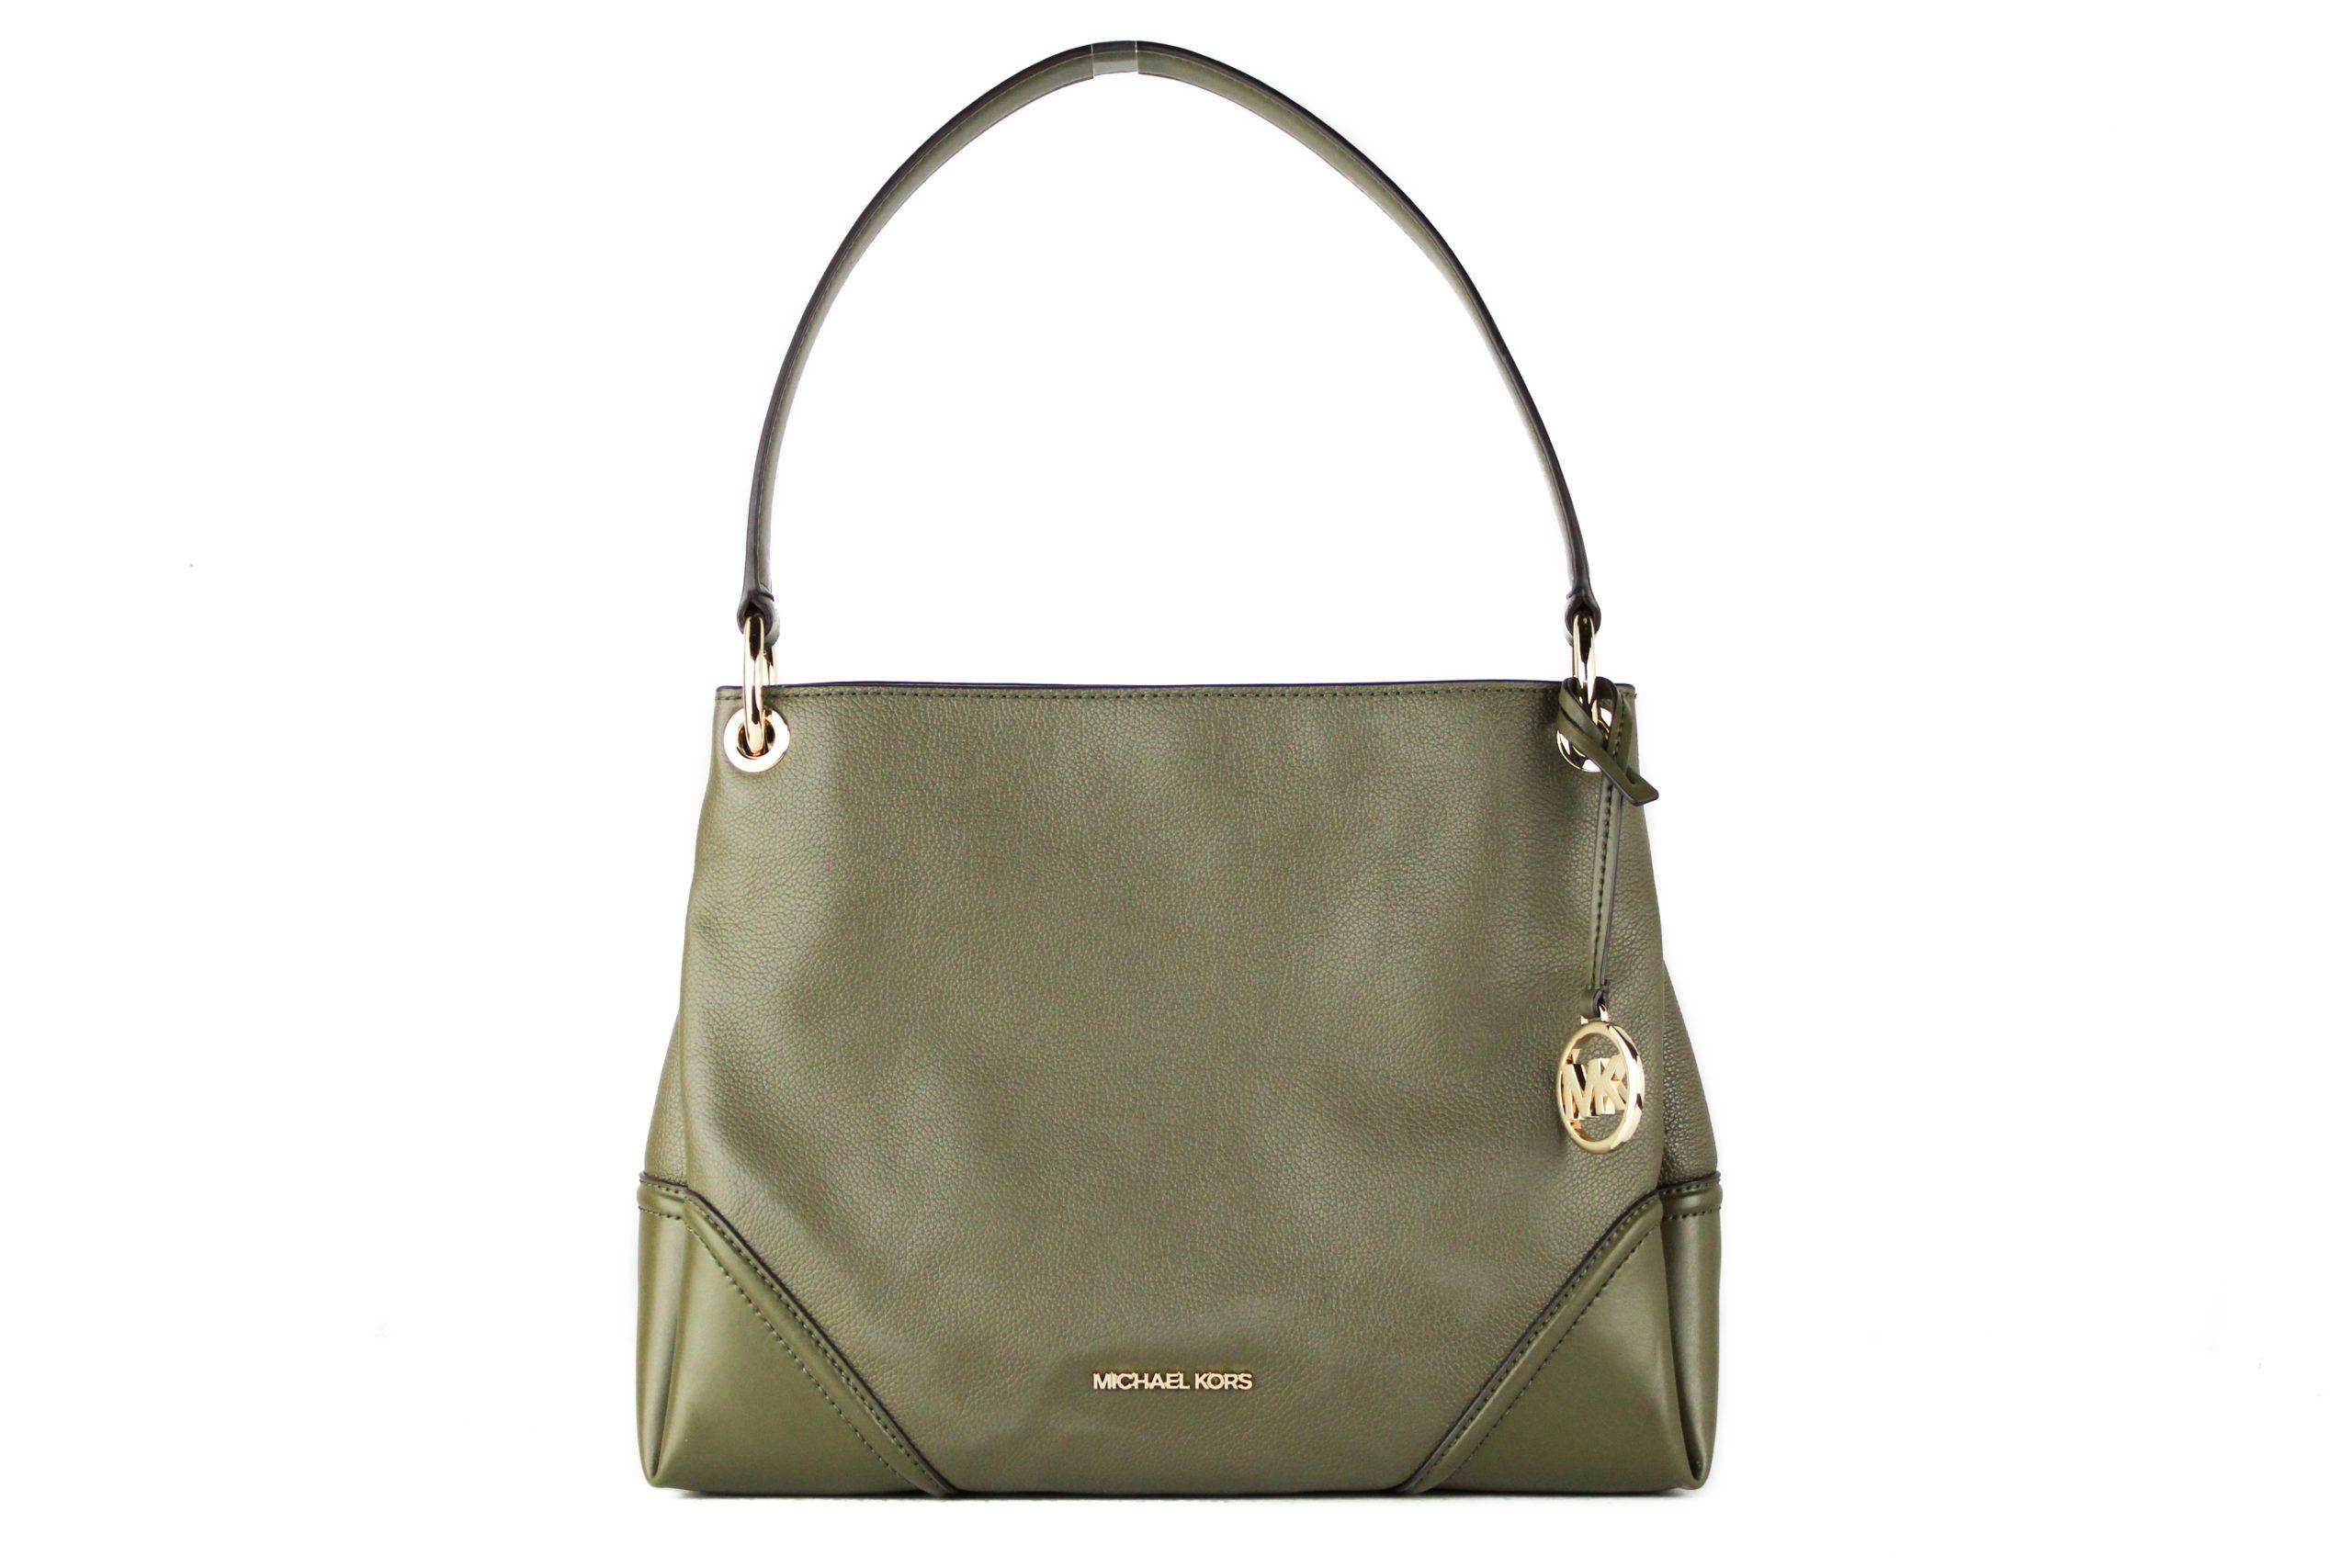 Michael Kors Women's Nicole Leather Shoulder Bag Green 40367